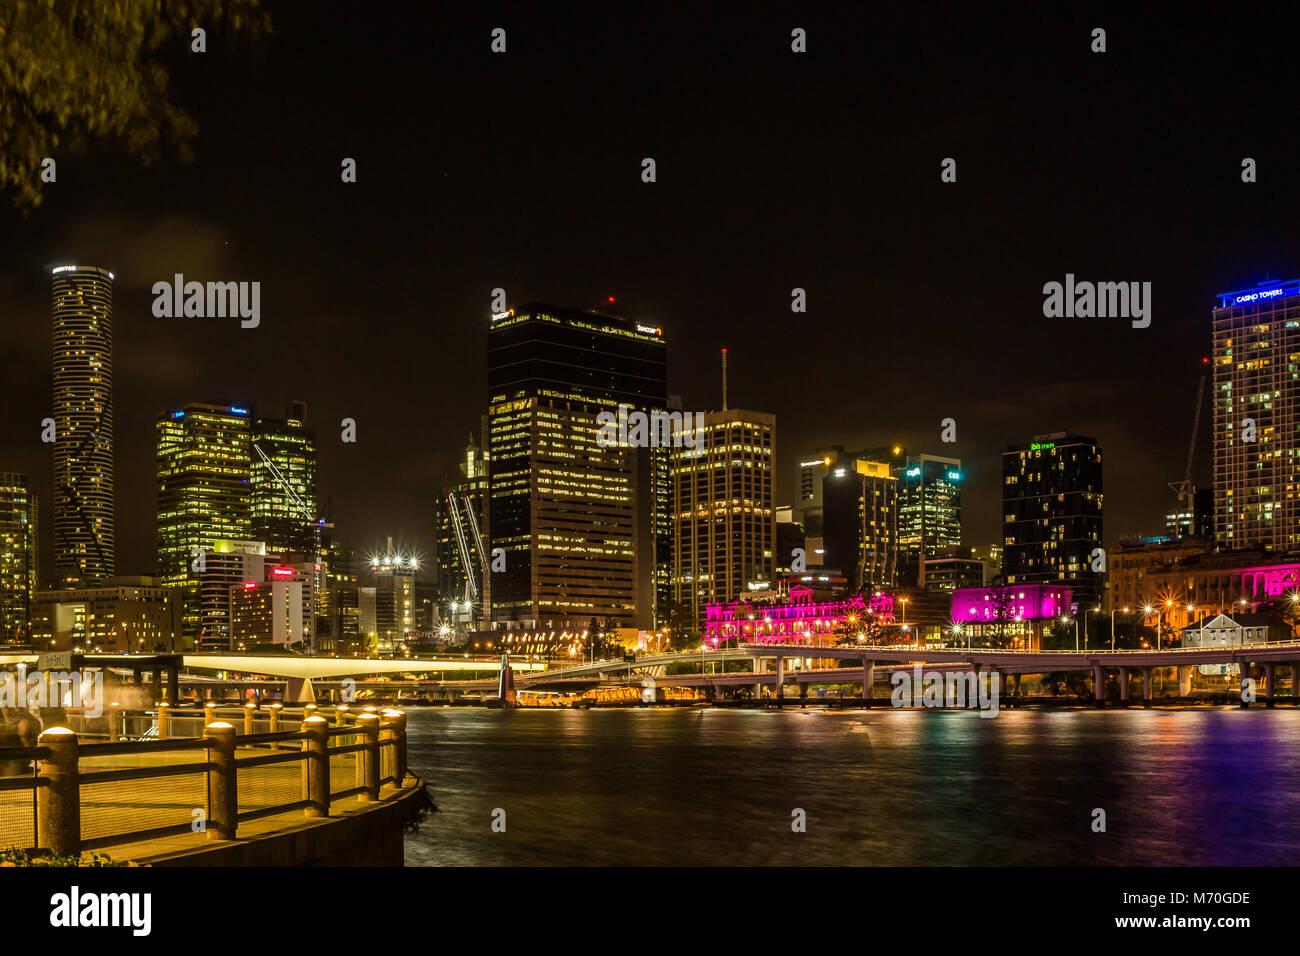 Brisbane night shot - Stock Image